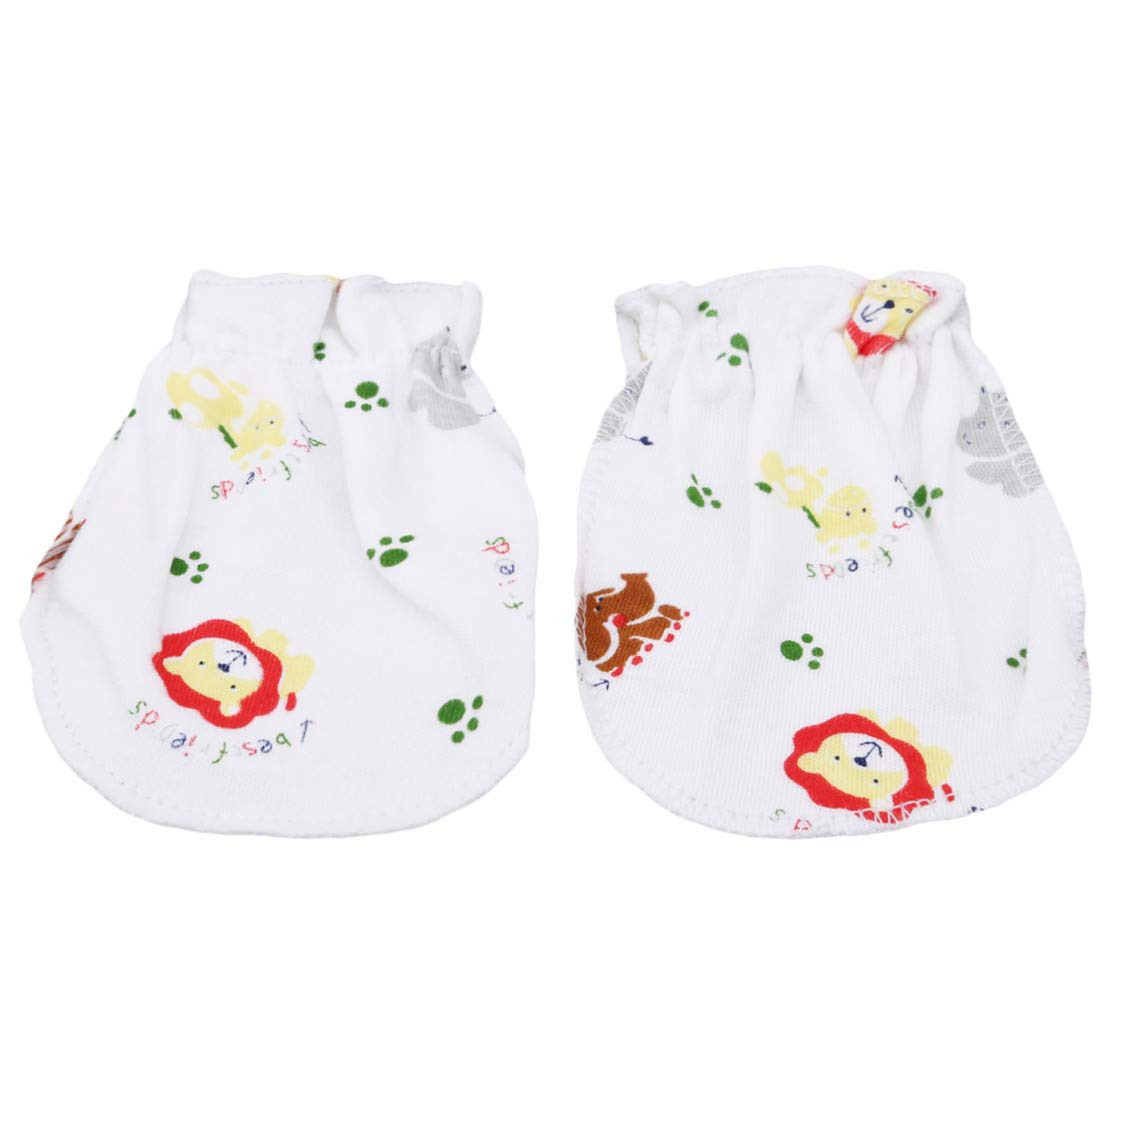 Idiytip Neugeborenen Handschuhe 100% Super Soft Cotton Baby Fäustlinge Infant Pastell Scratch Baumwolle Fäustlinge grüner Frosch QingYing